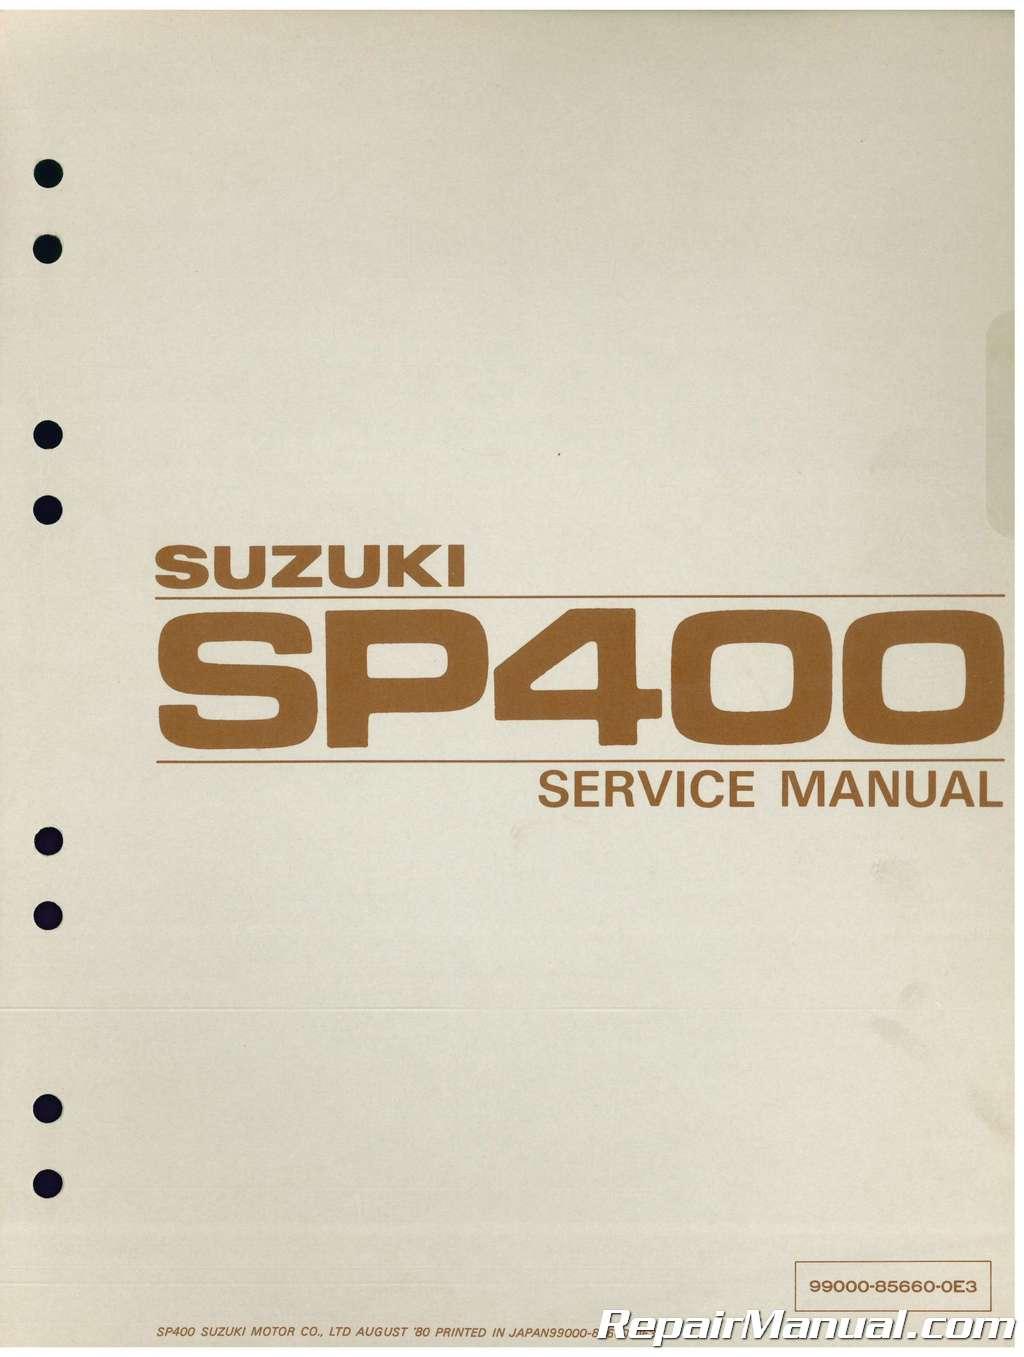 hight resolution of gn400 wiring diagram 1980 suzuki sp400 dr400 gn400 motorcycle service manual1980 suzuki sp400 dr400 gn400